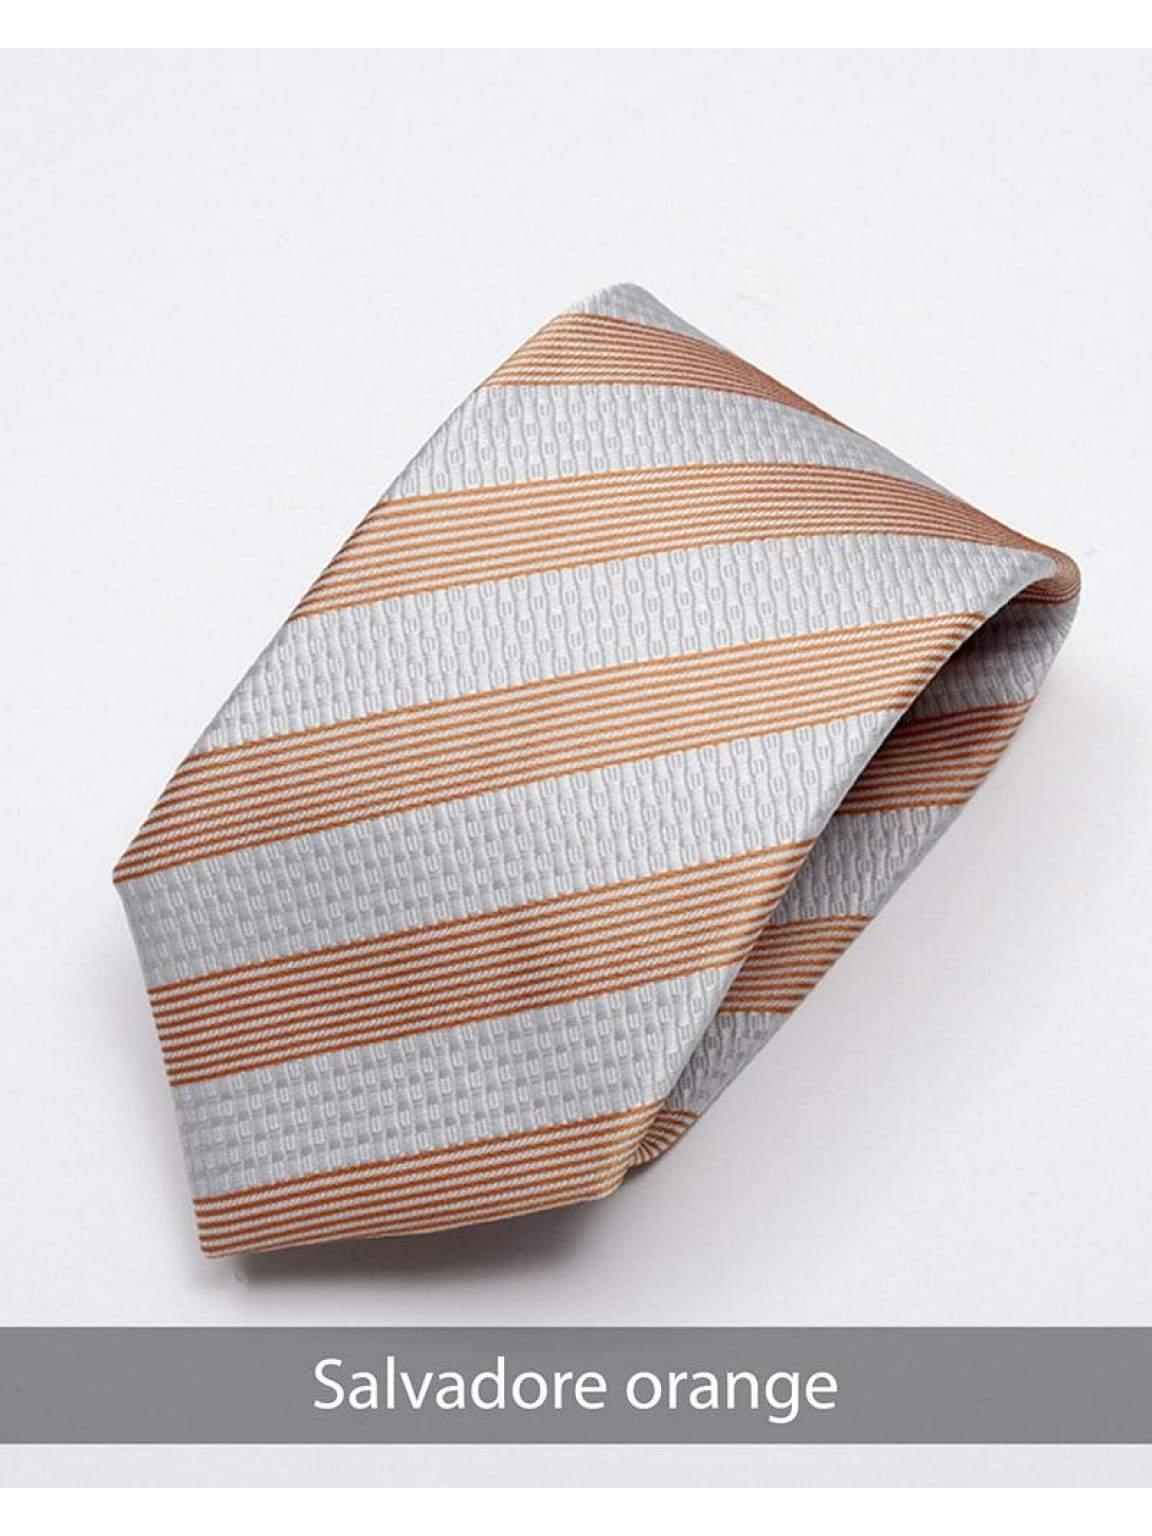 Heirloom salvadore Mens Orange Stripped Tie - Accessories